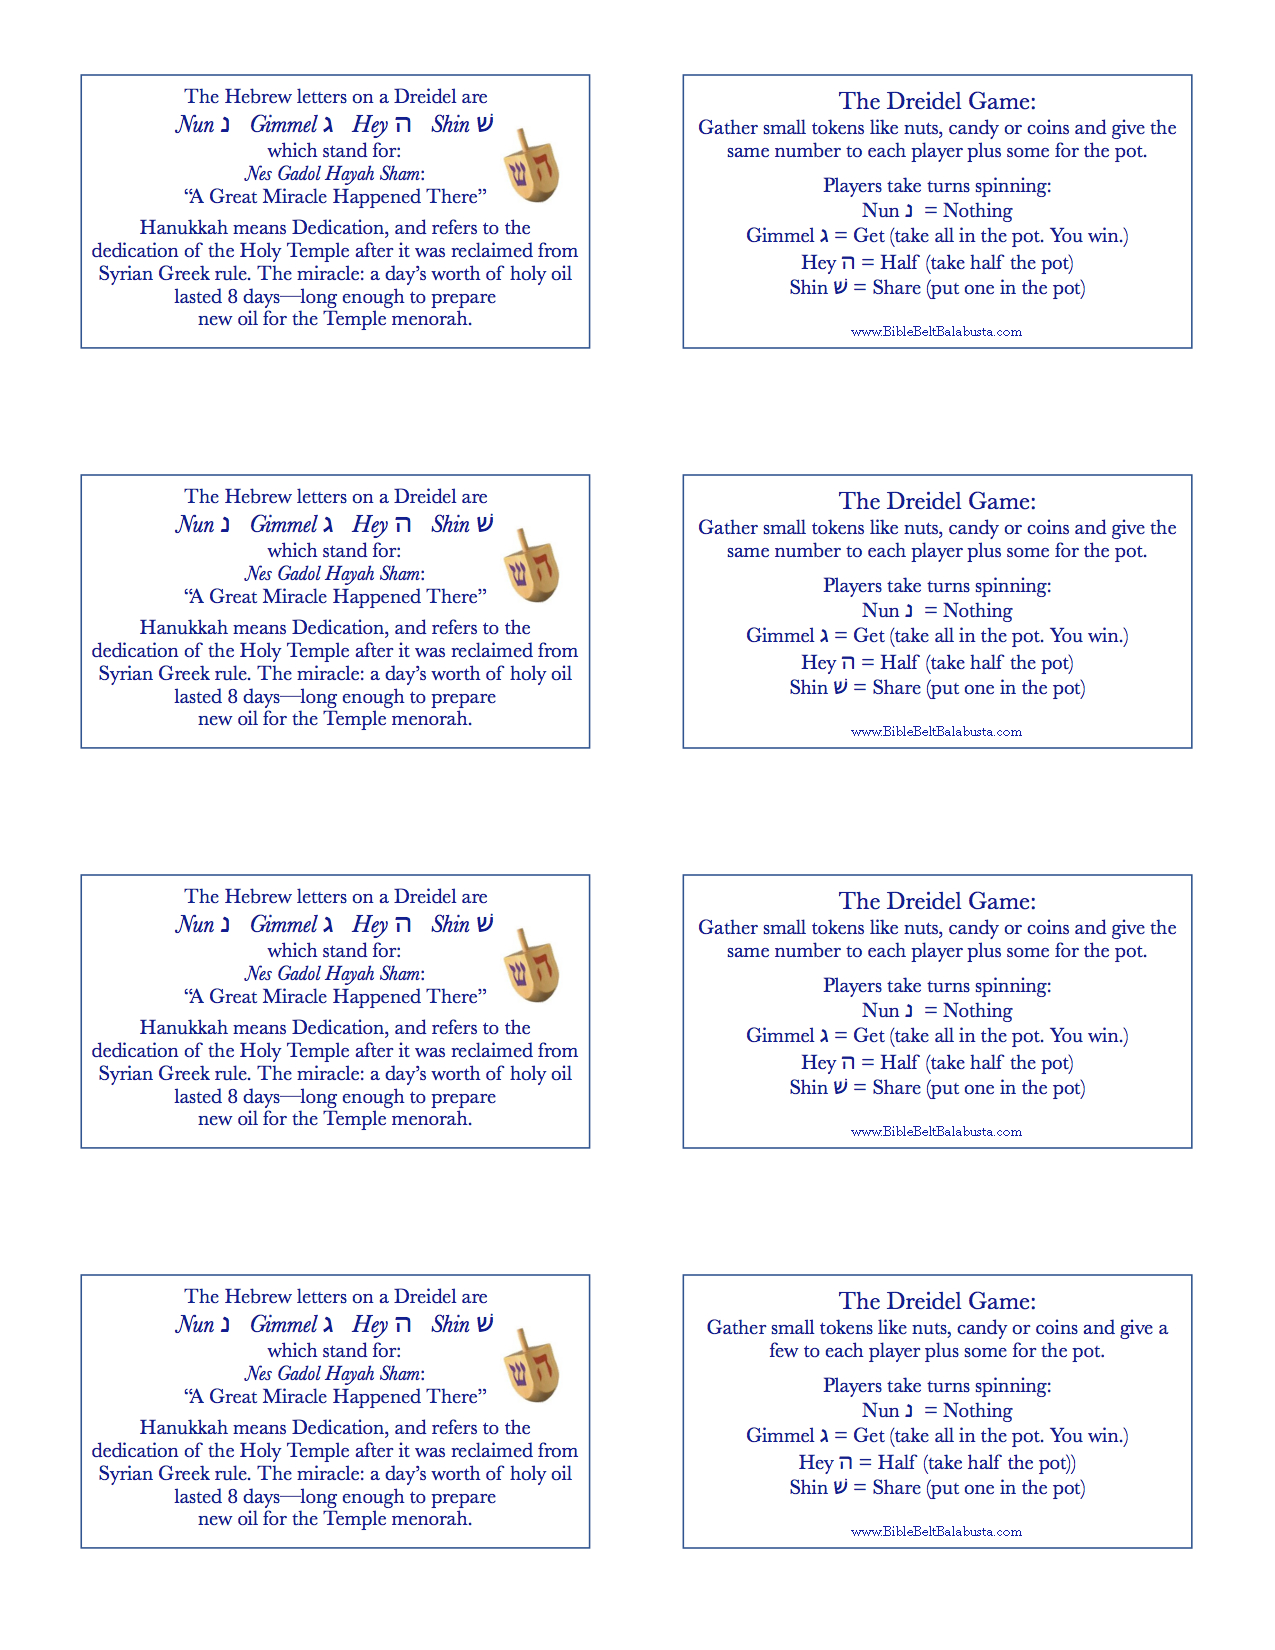 photograph regarding How to Play Dreidel Printable titled Printable Dreidel Guidelines (reward tags) Bible Belt Balabusta